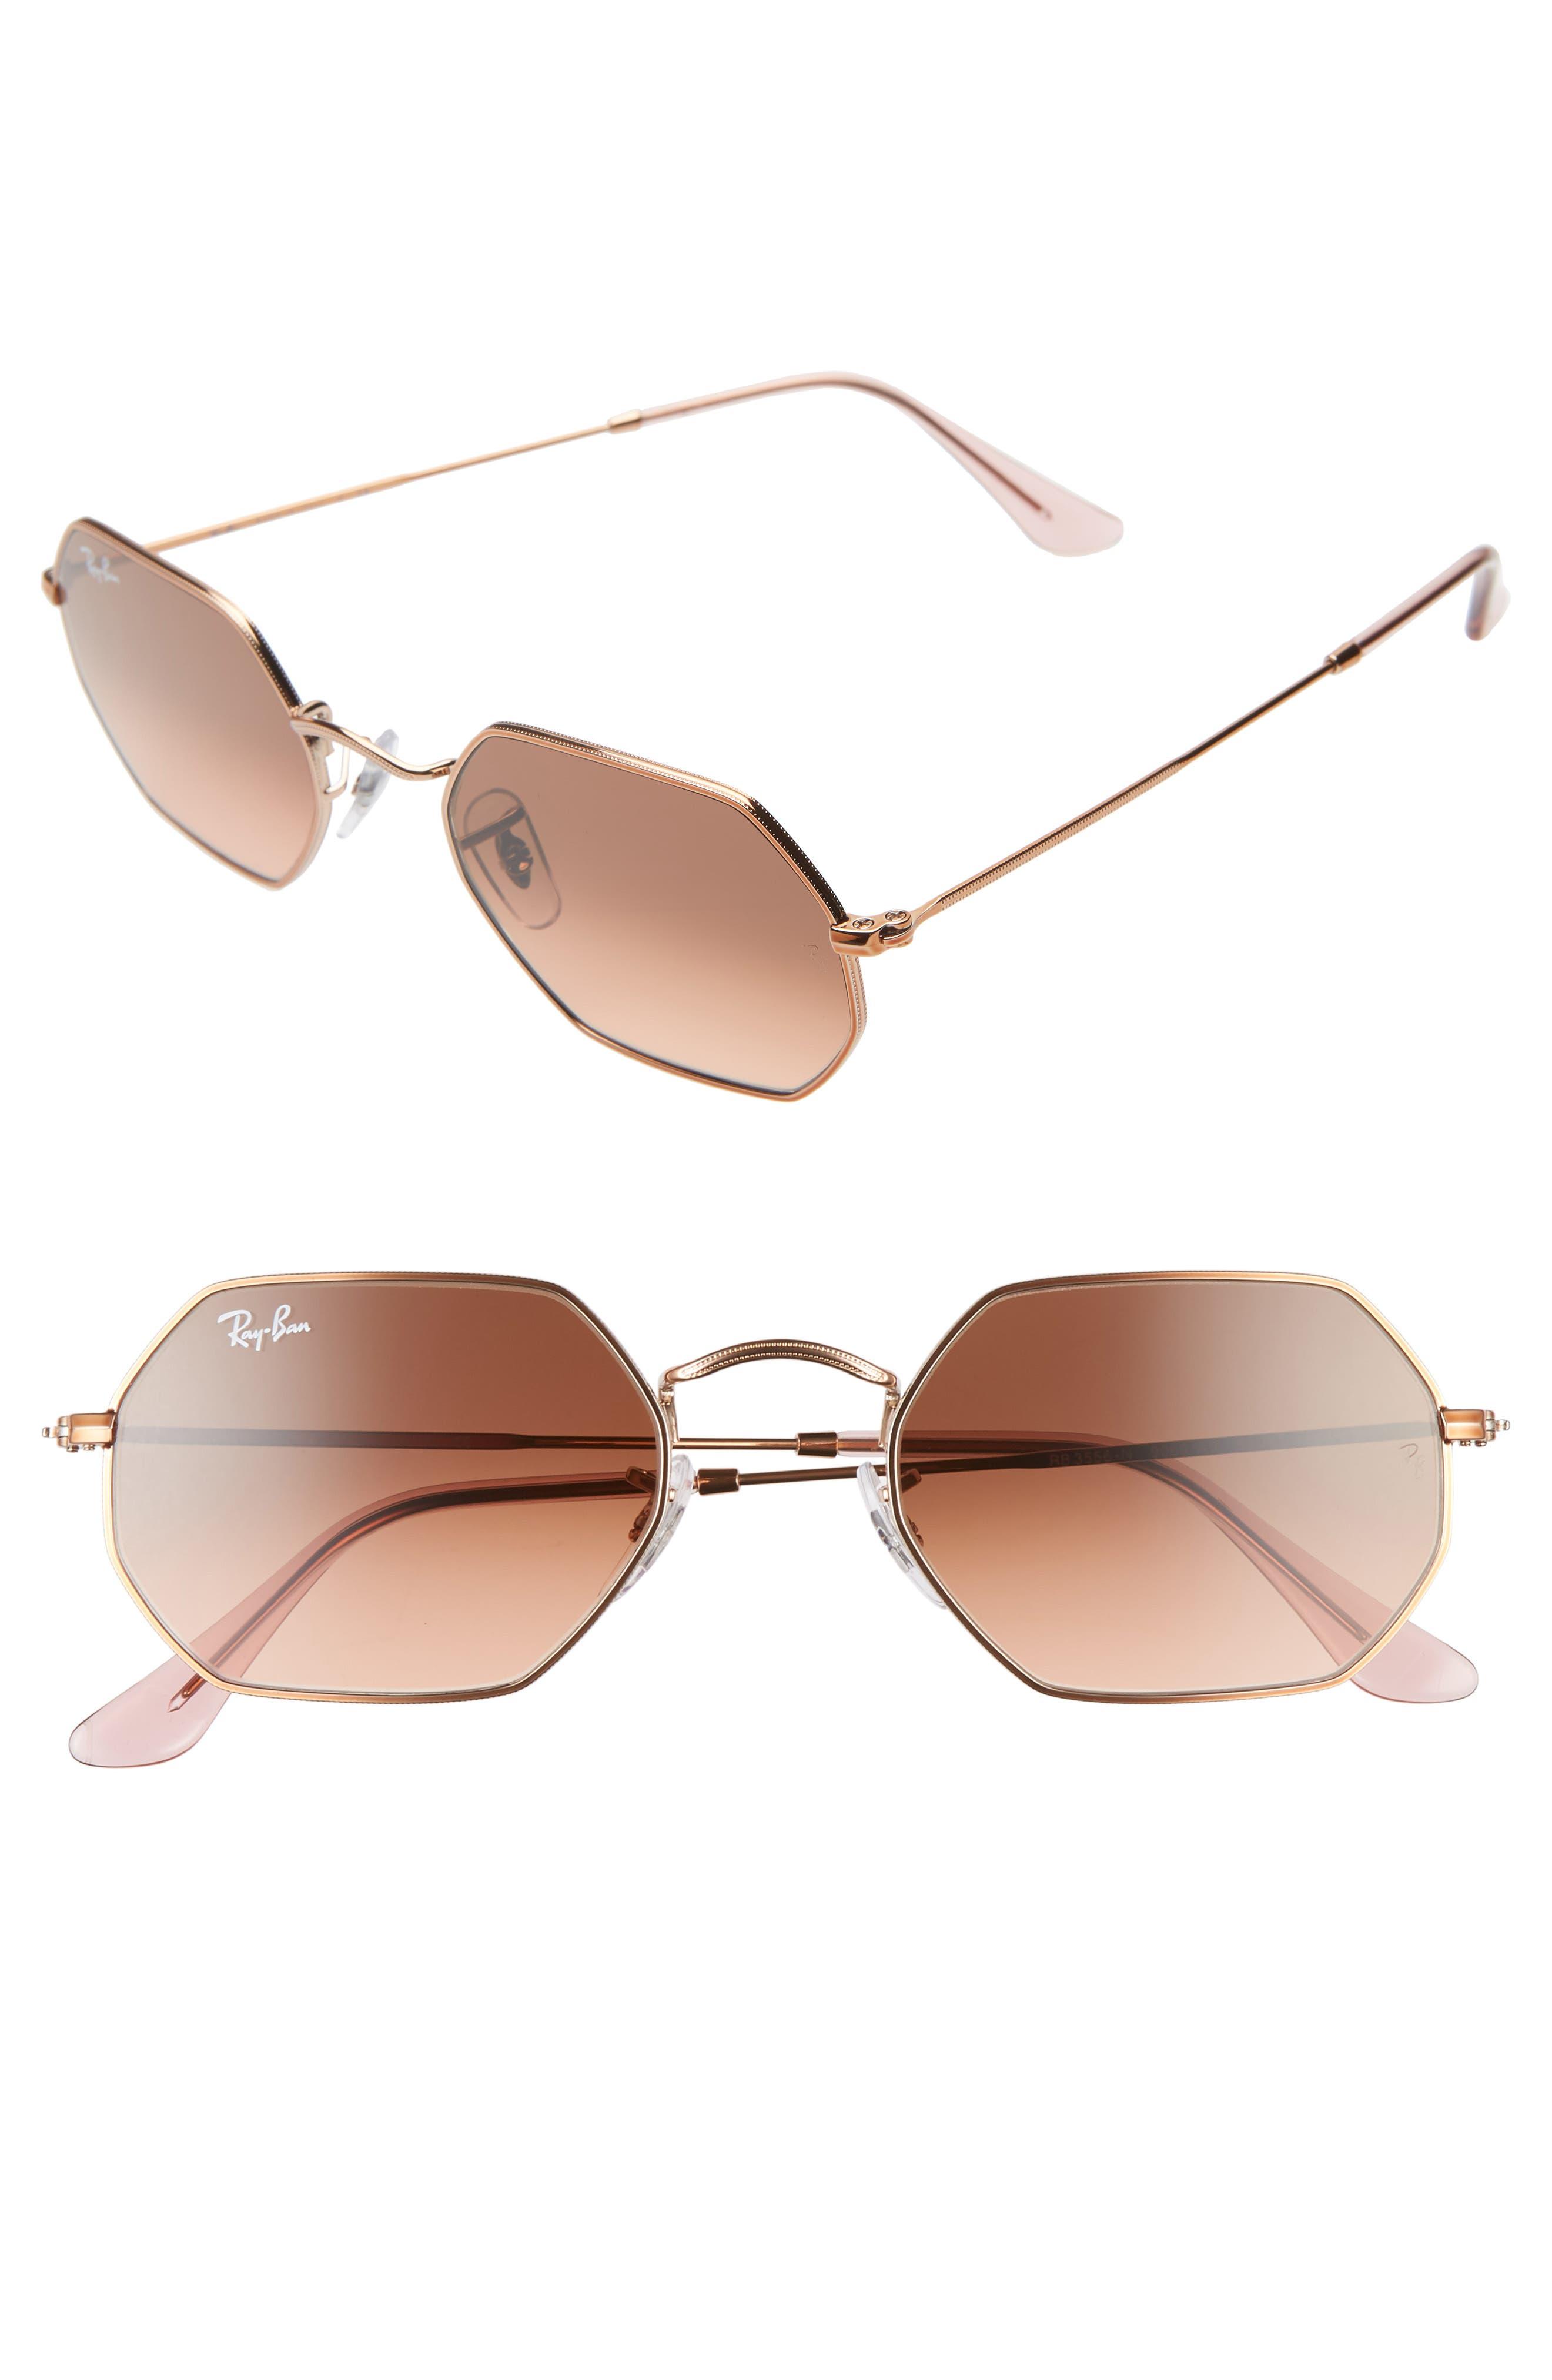 Ray-Ban 5m Rectangular Sunglasses - Copper/ Copper Gradient